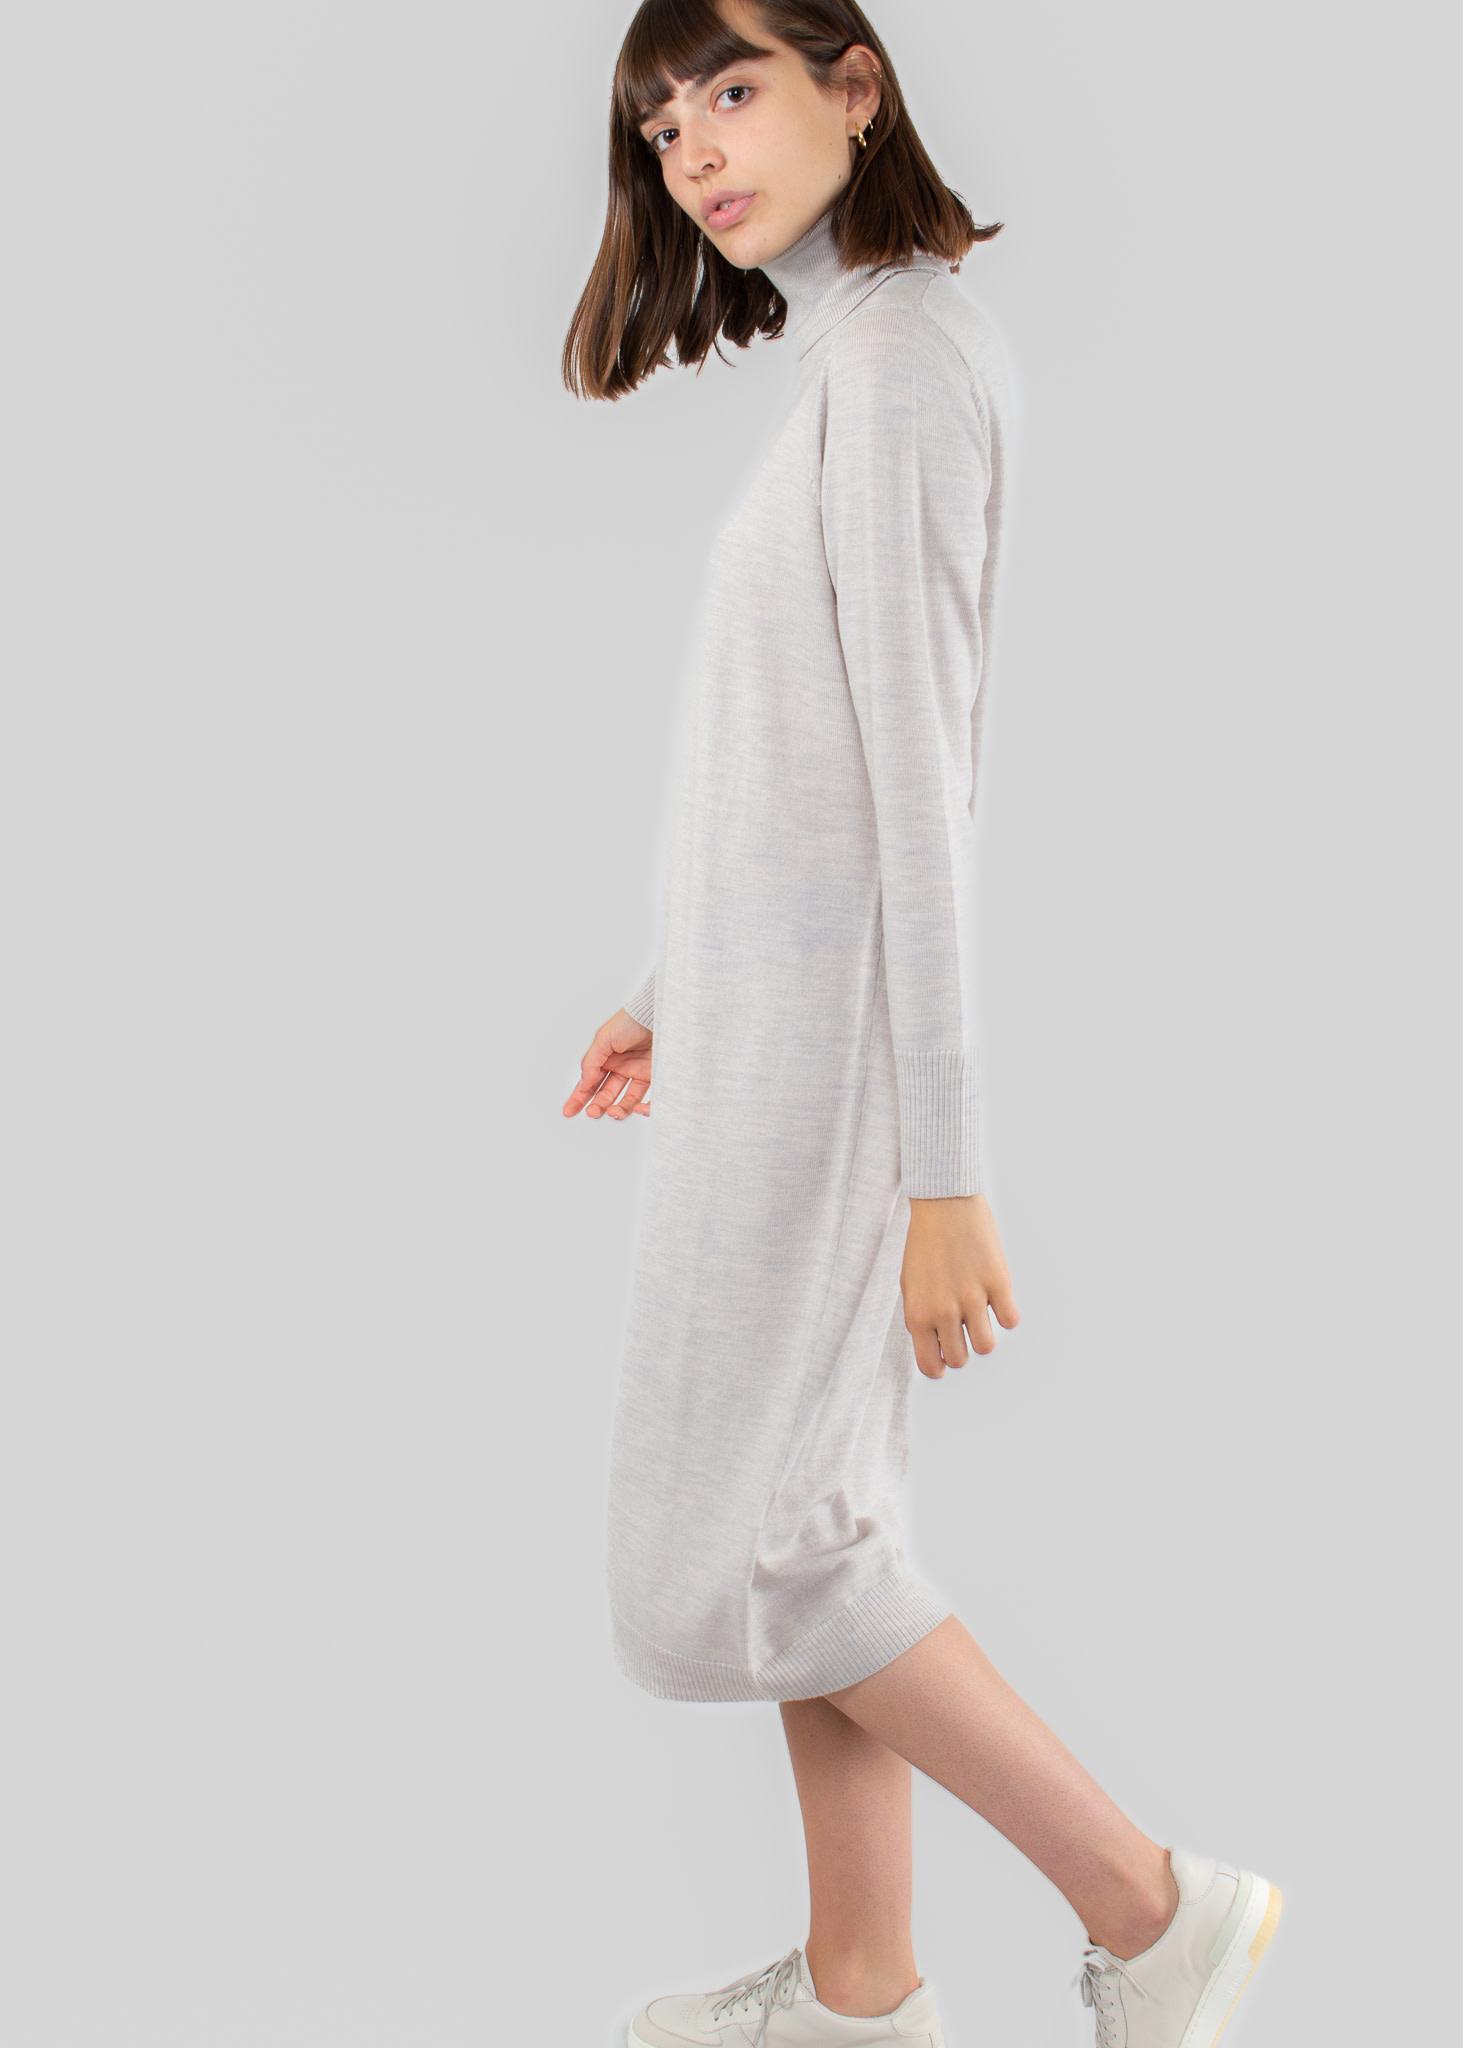 REPEAT 300140 - Robe laine mérino